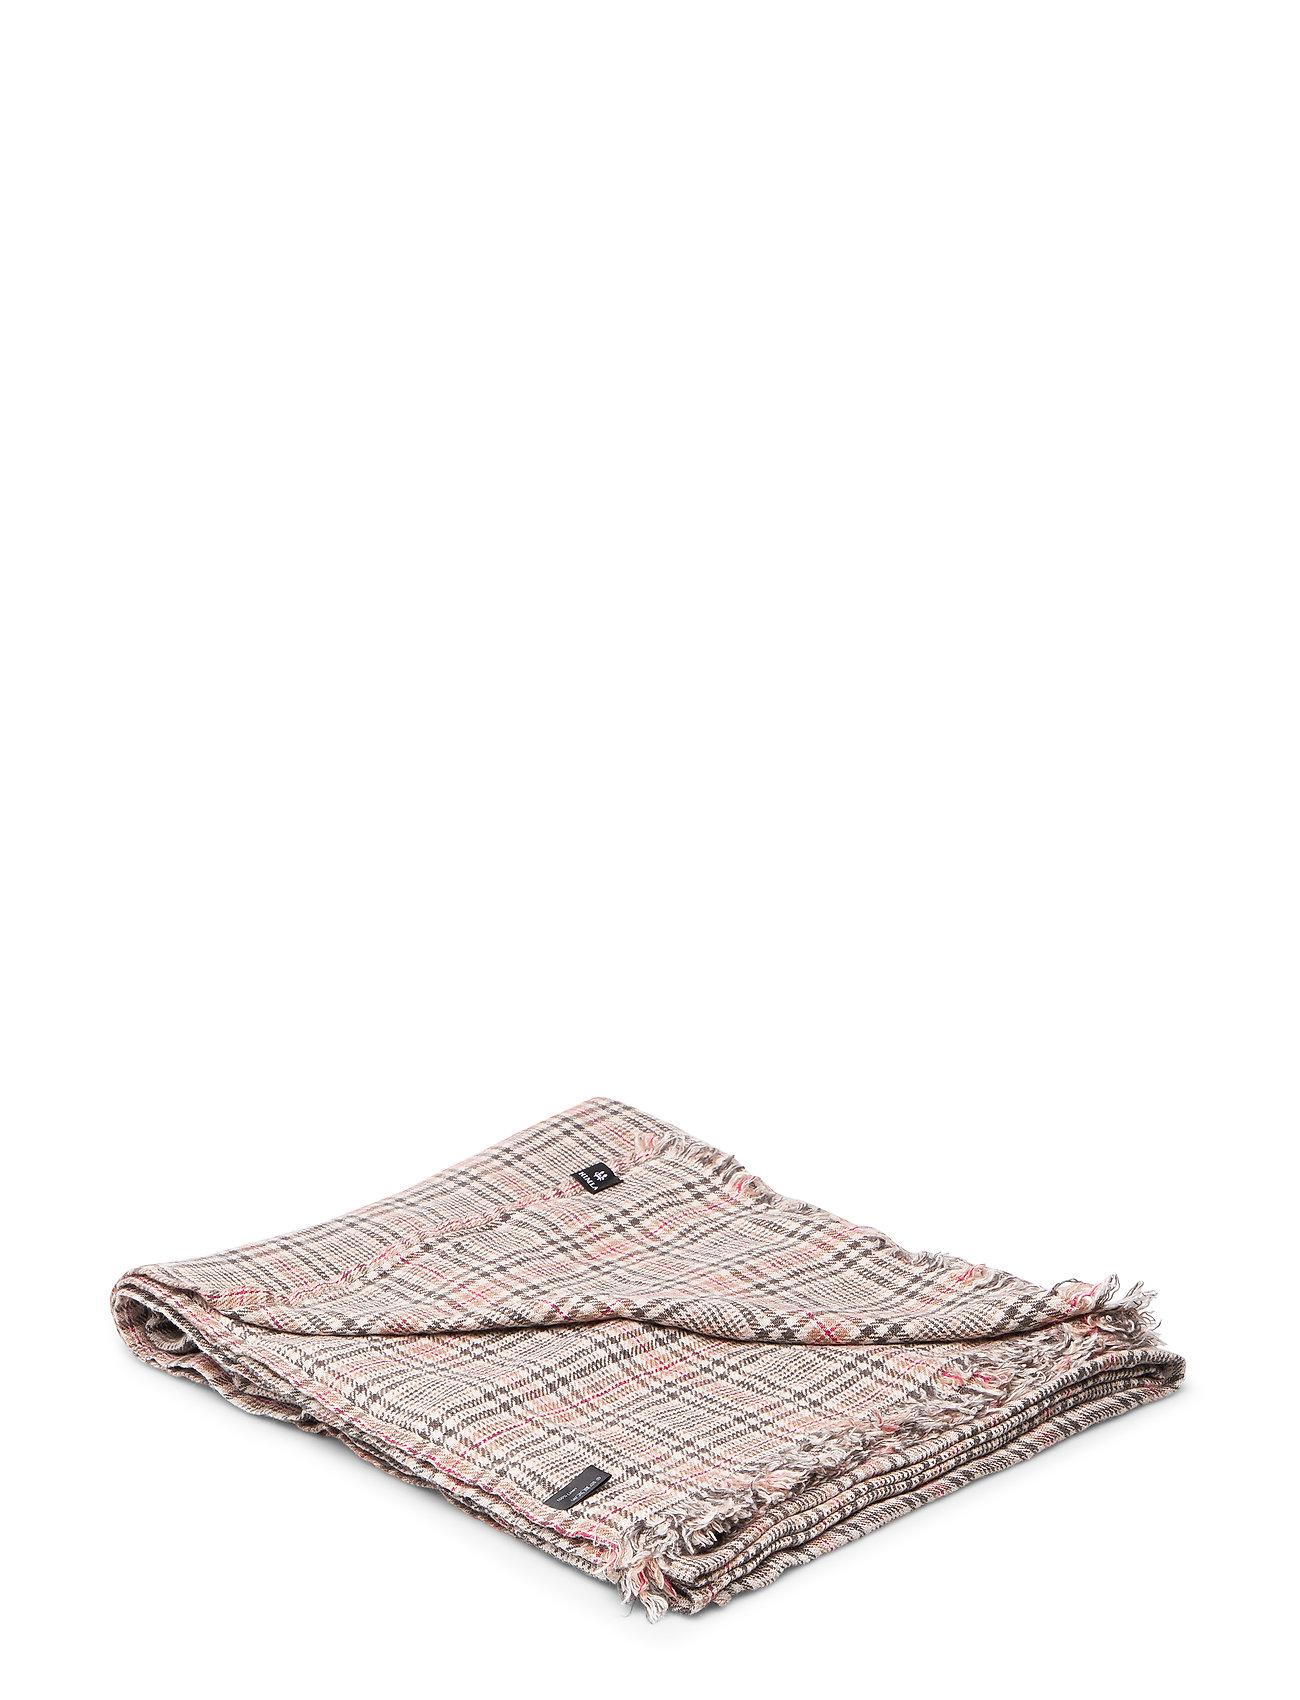 Himla Urban Soul Pillowcase - NATURAL